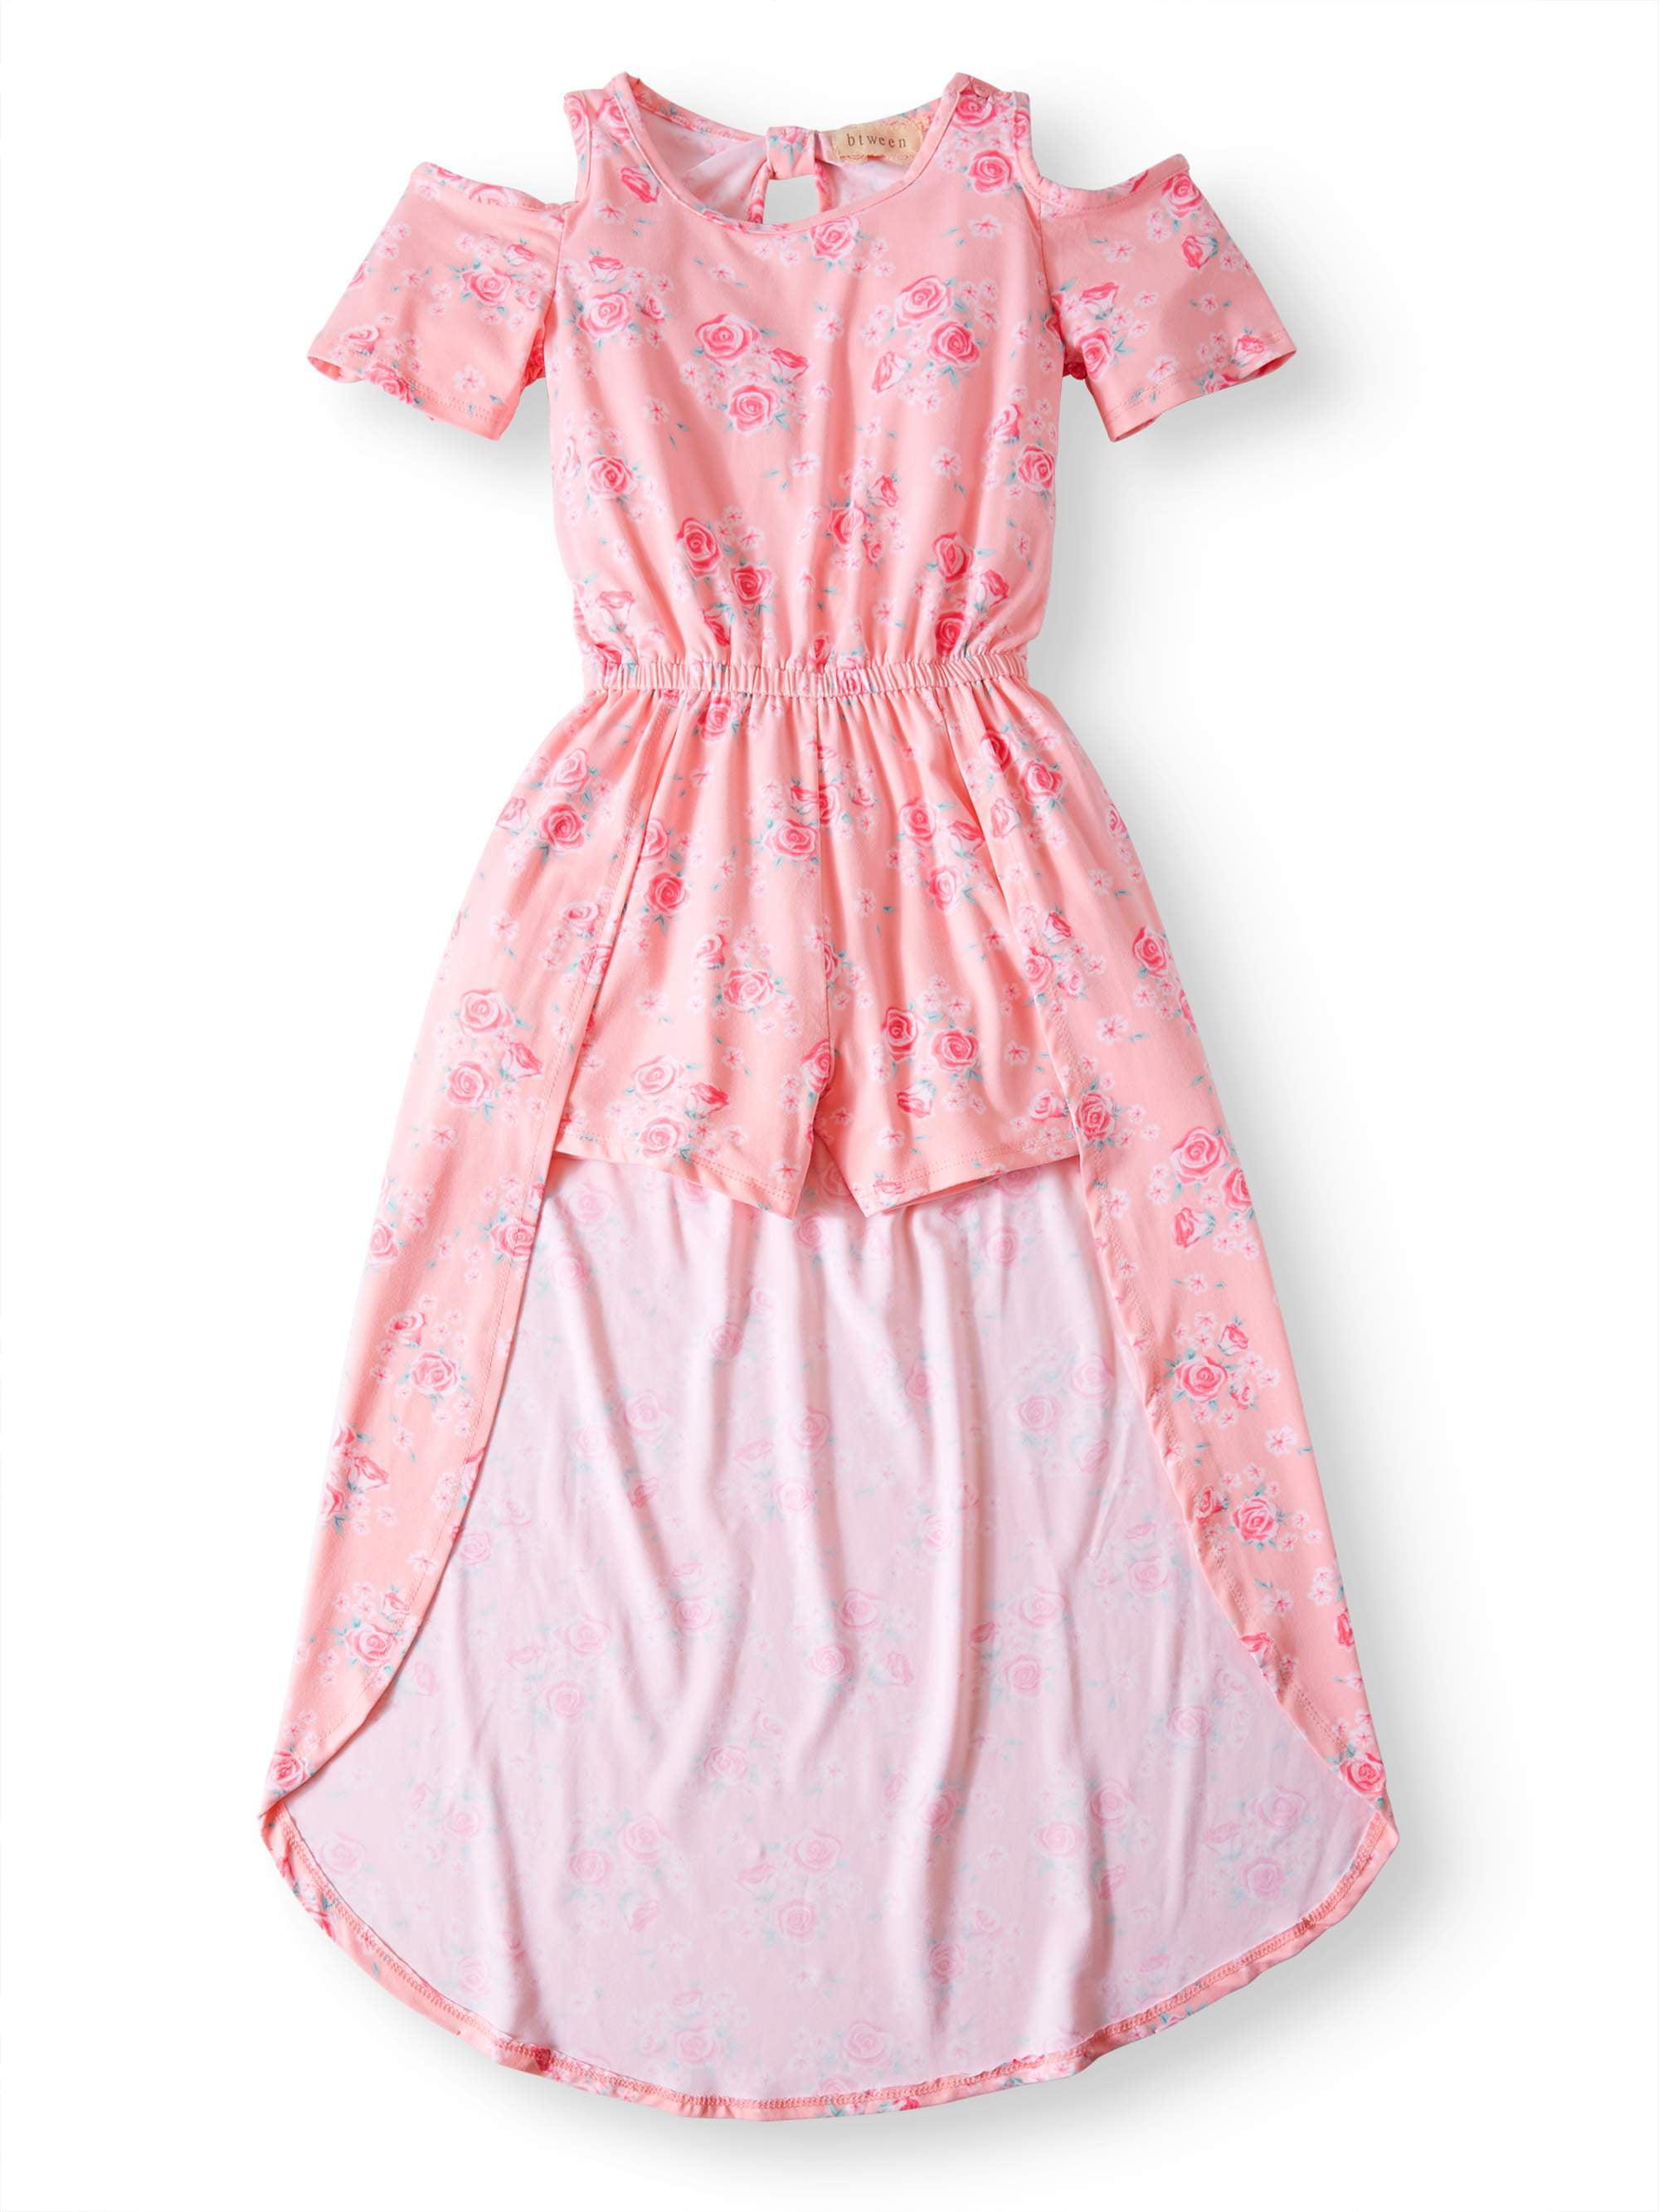 Big Girls' Floral Walk-Thru Romper Dress